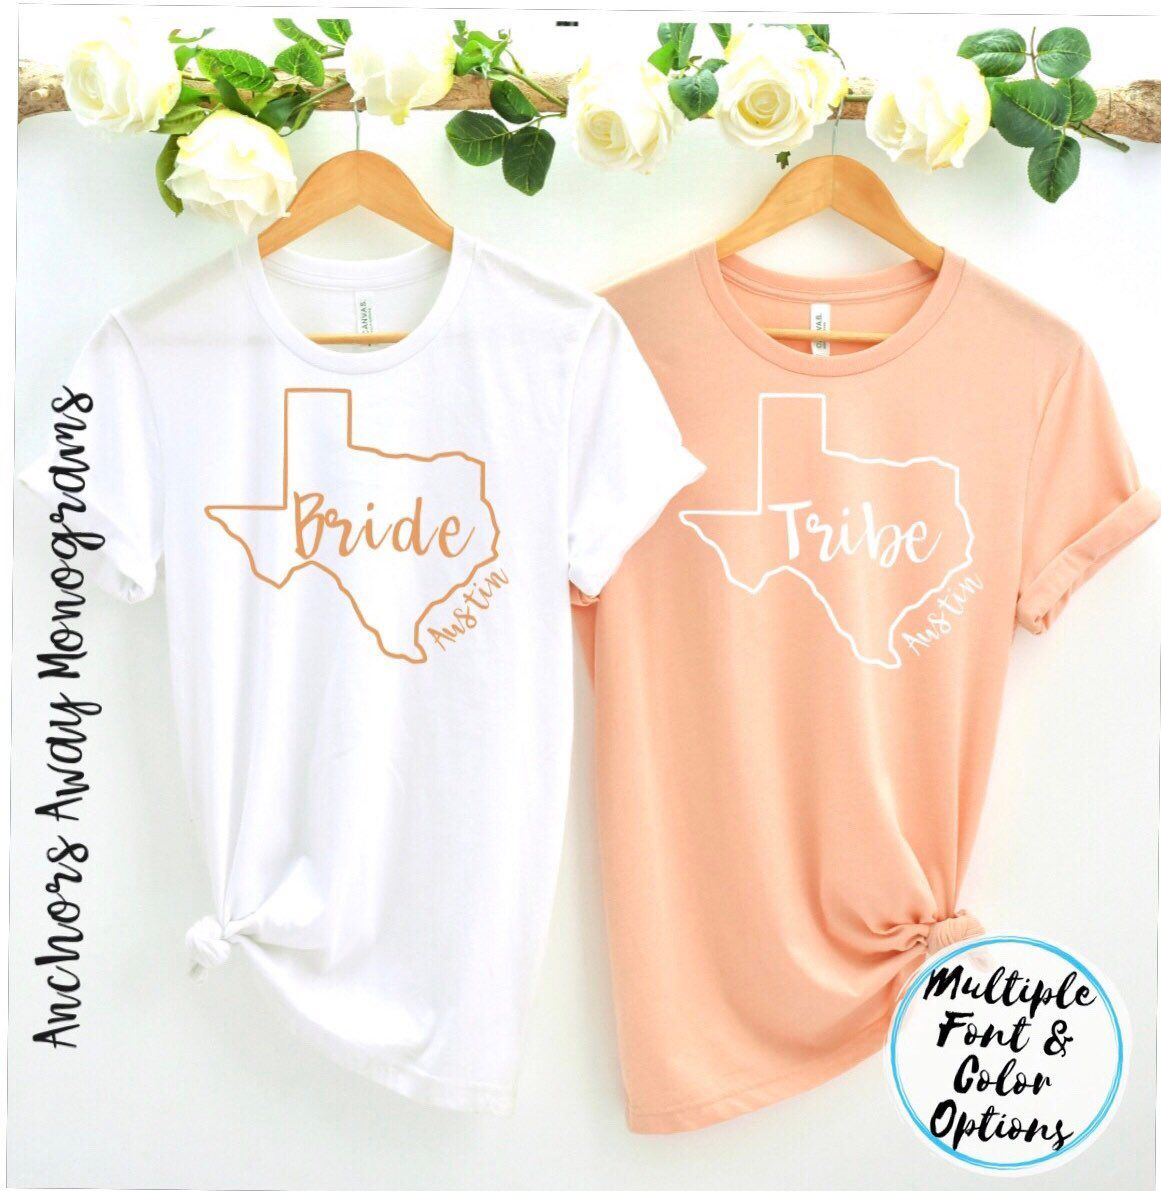 Austin Bride Tribe Shirts Bachelorette Party Shirts Custom Bridal